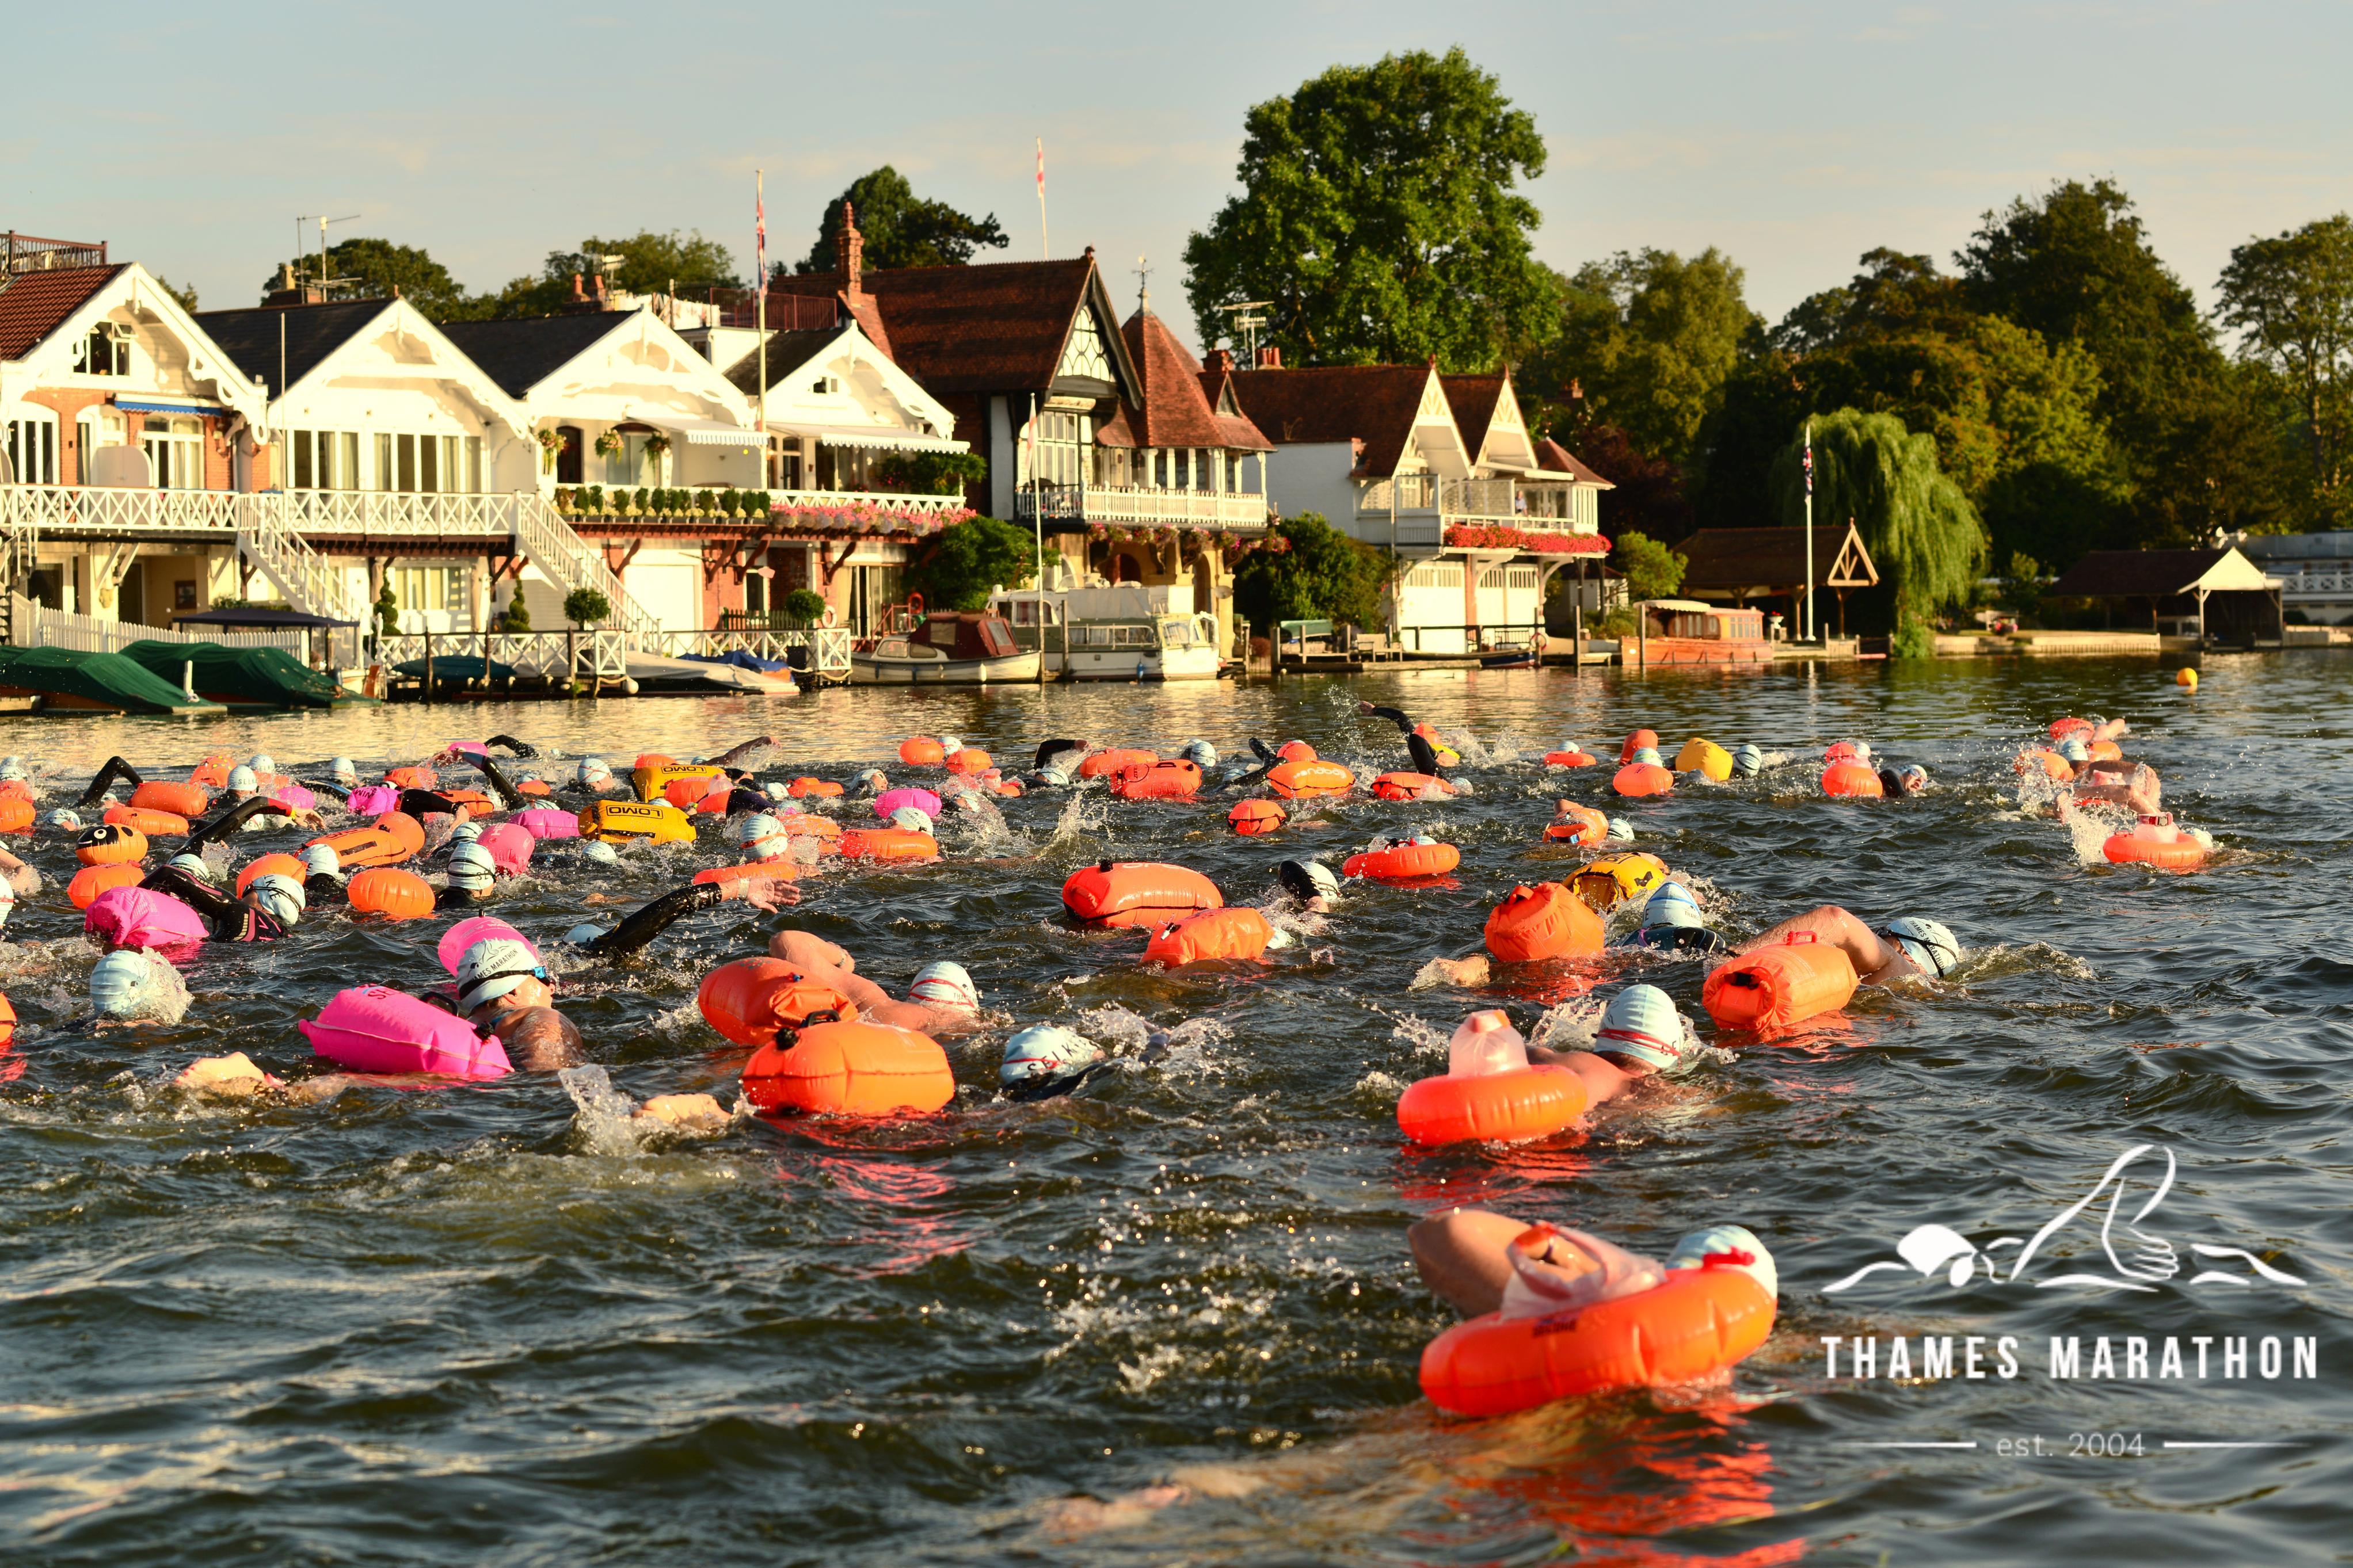 Thames Marathon Swim - cover image